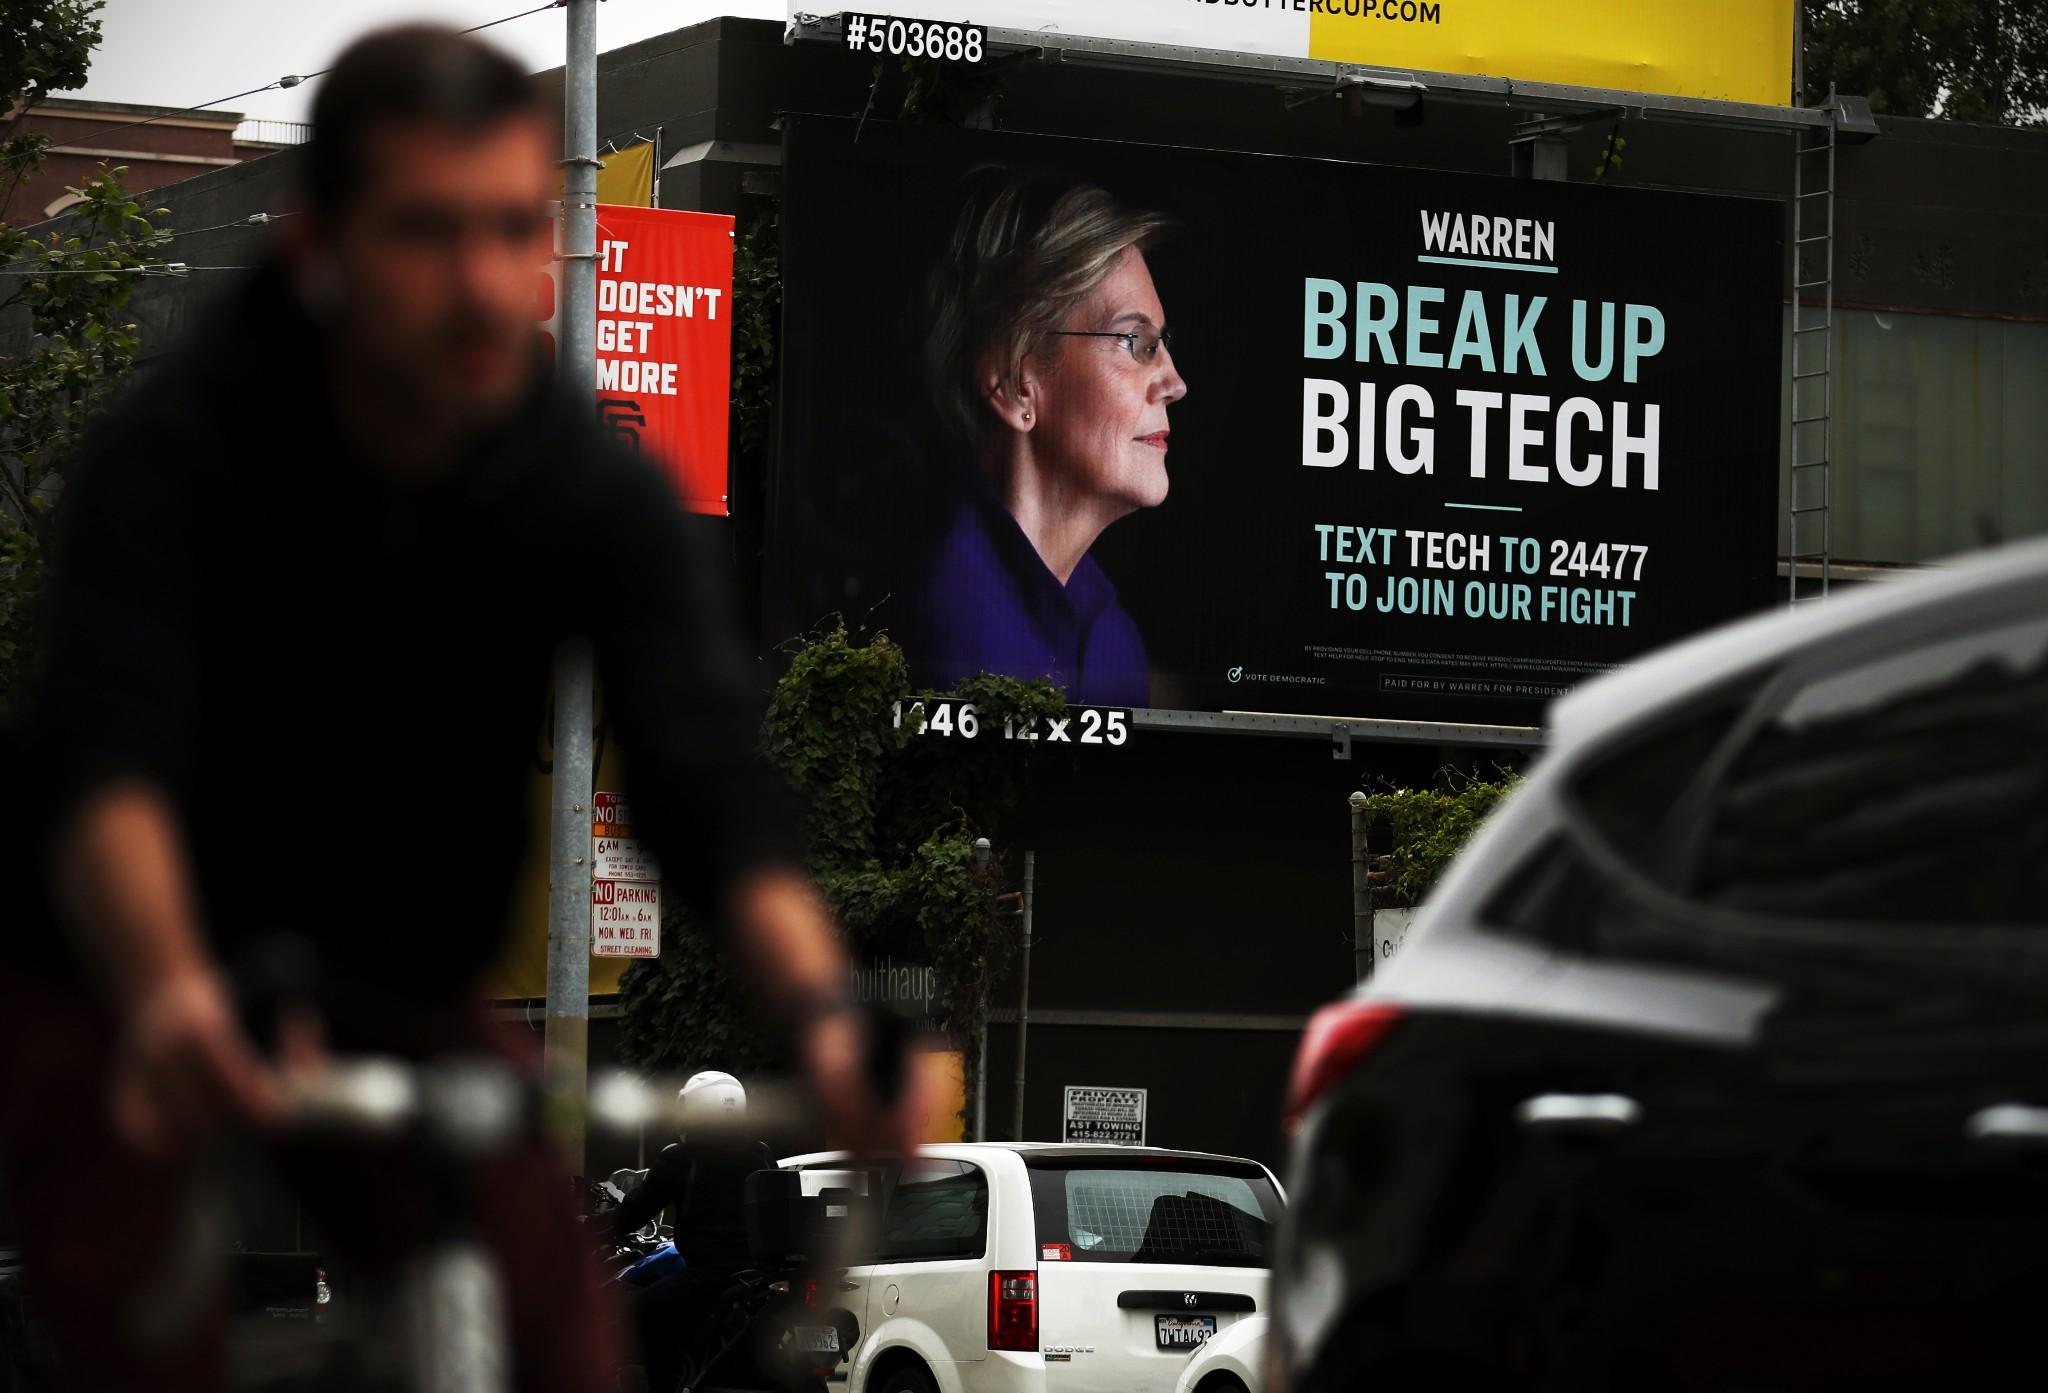 Year in Tech Review 2019: Big Tech Breakup